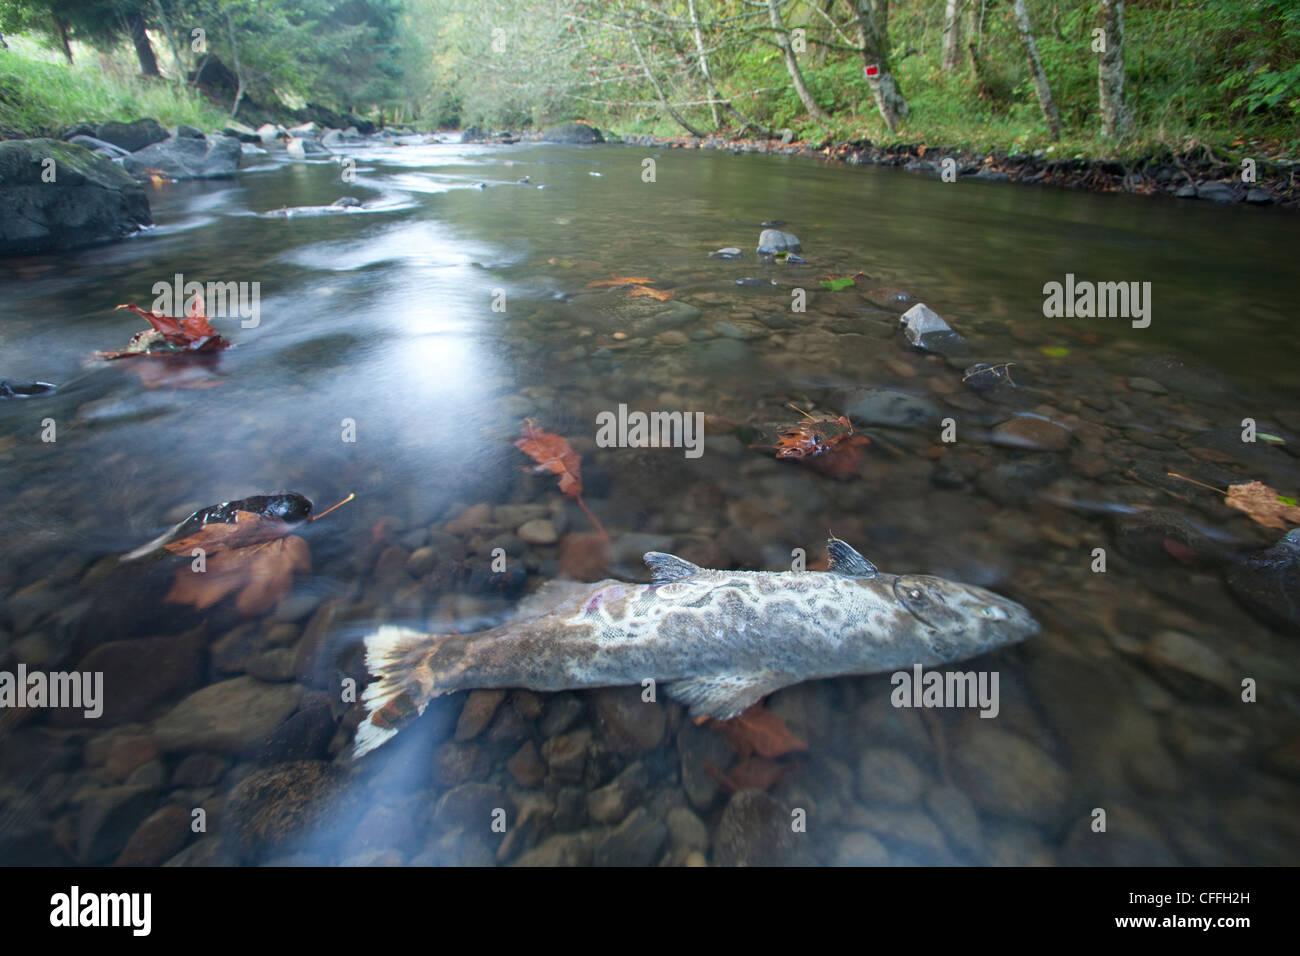 Coho salmon carcass in small coastal Oregon River. - Stock Image